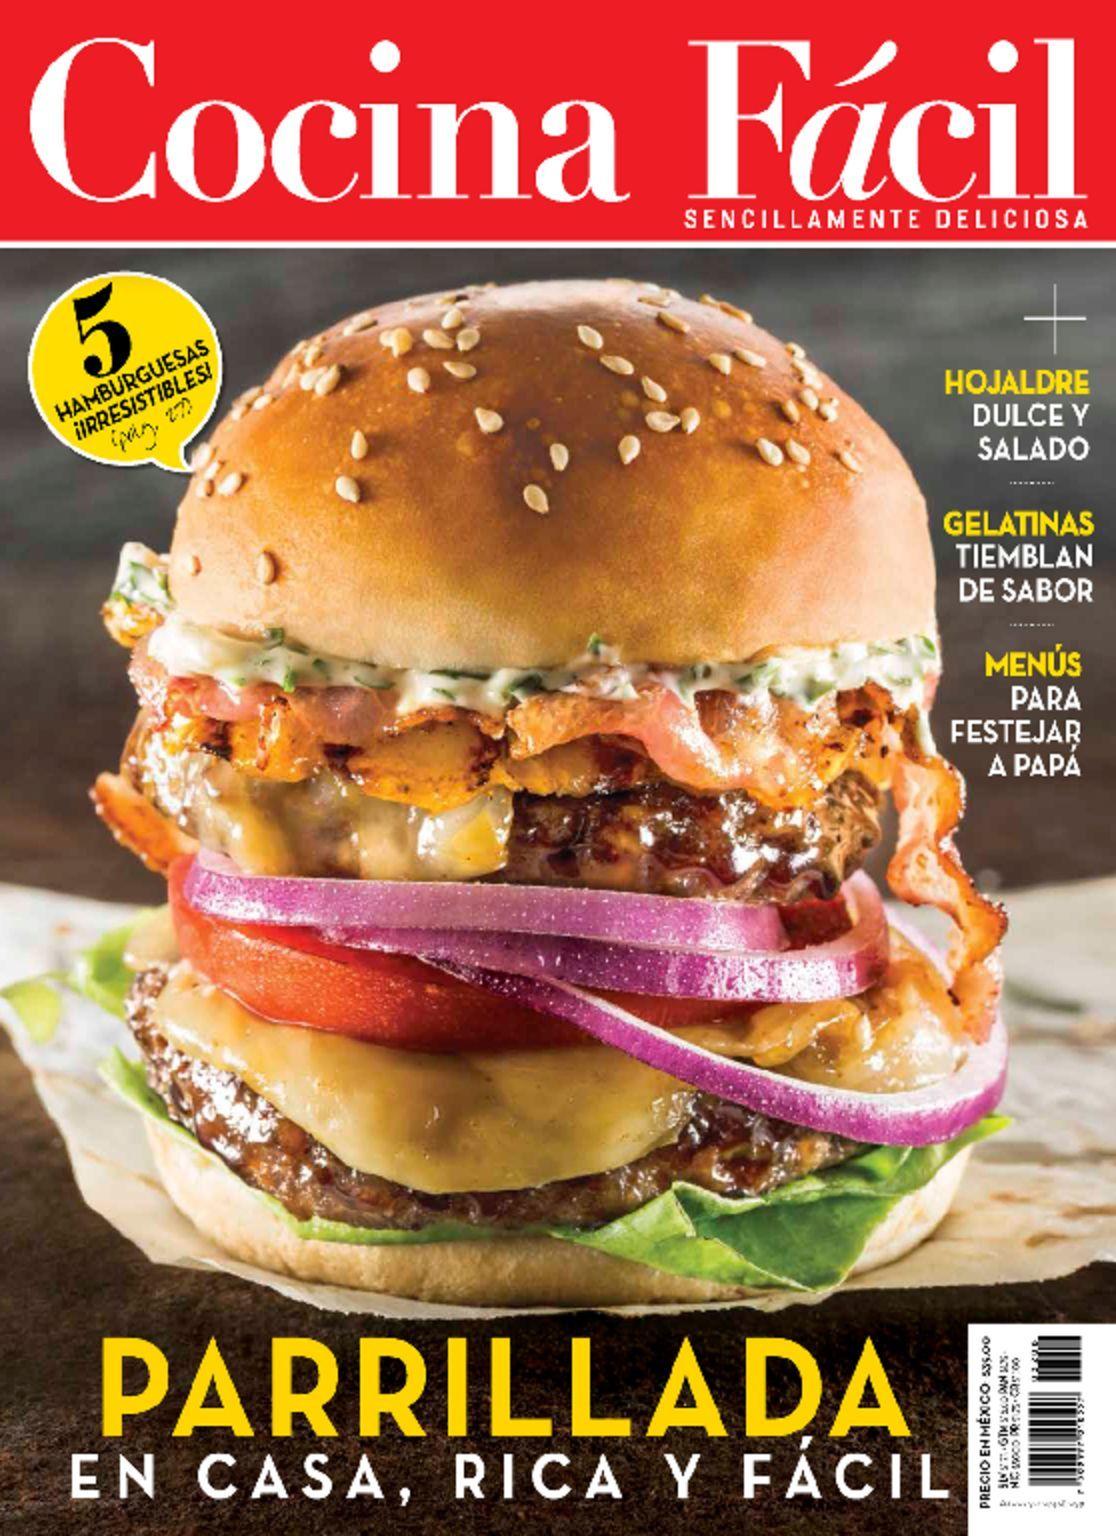 Cocina f cil magazine digital for Cocinar facil